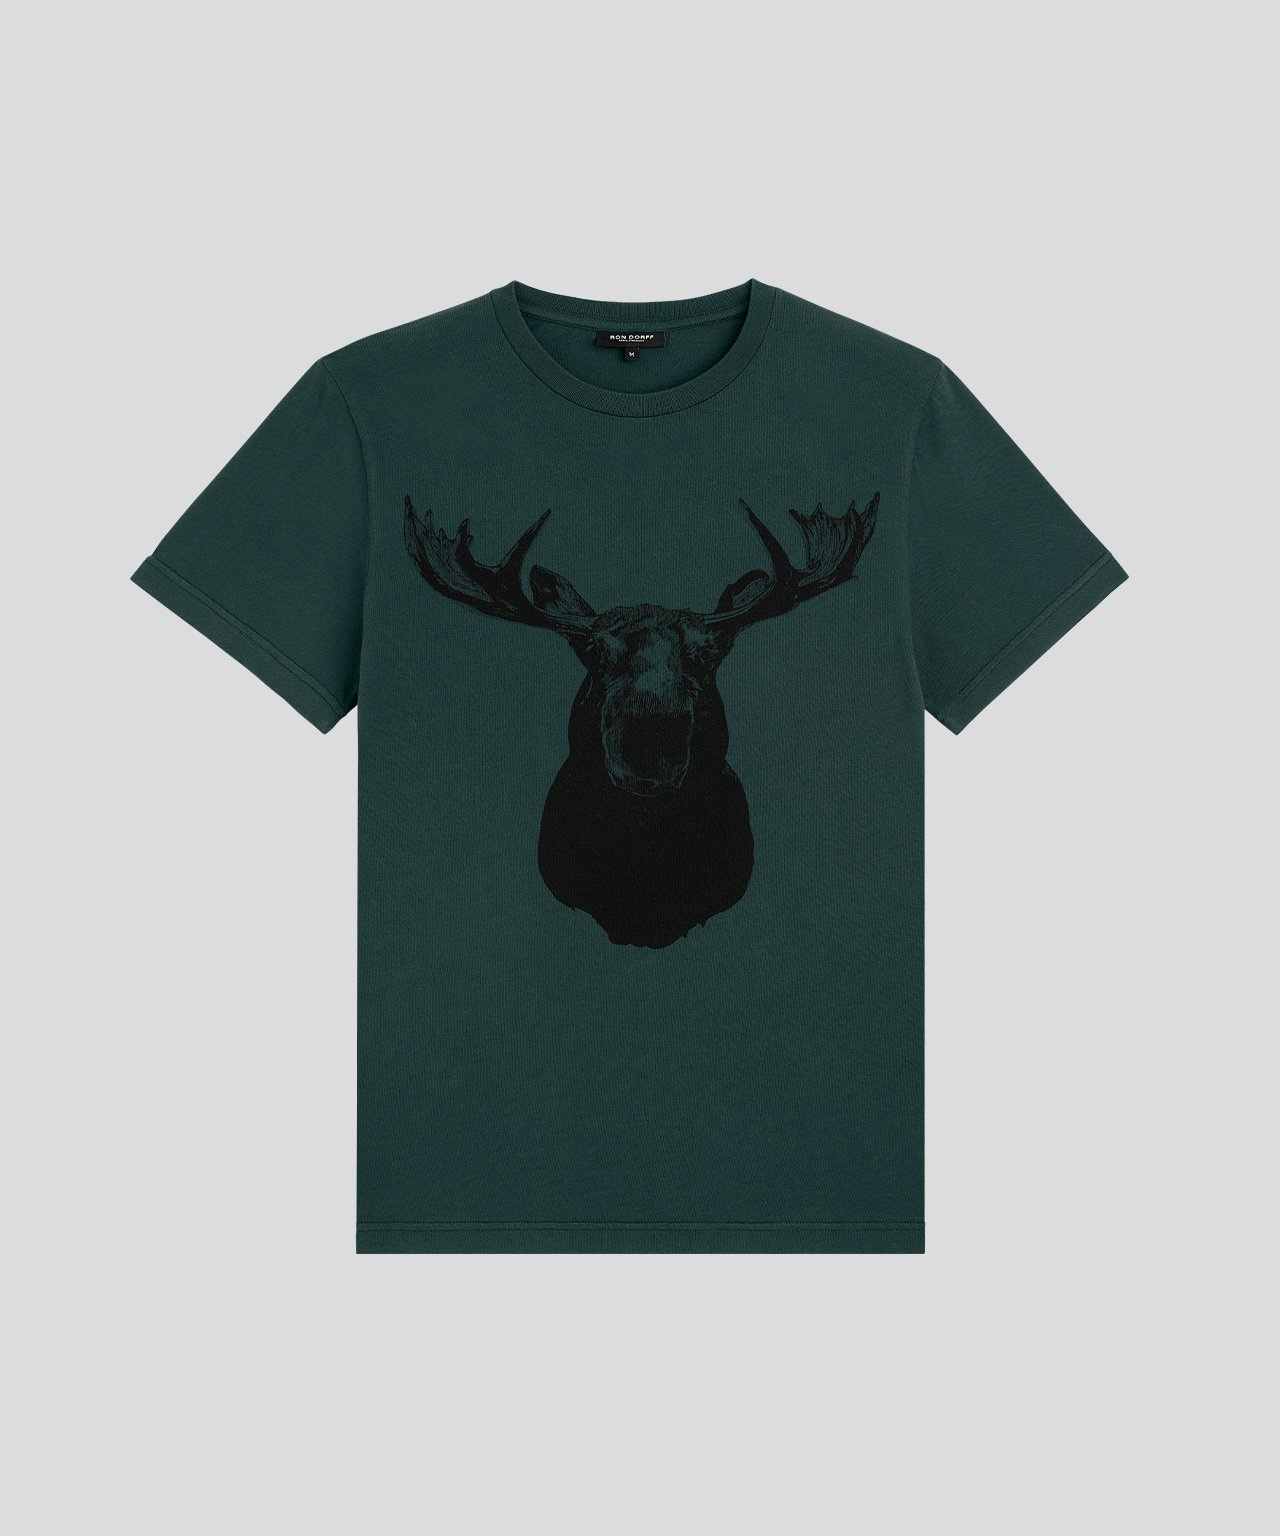 Ron Dorff MOOSE tshirt Tyrol Green